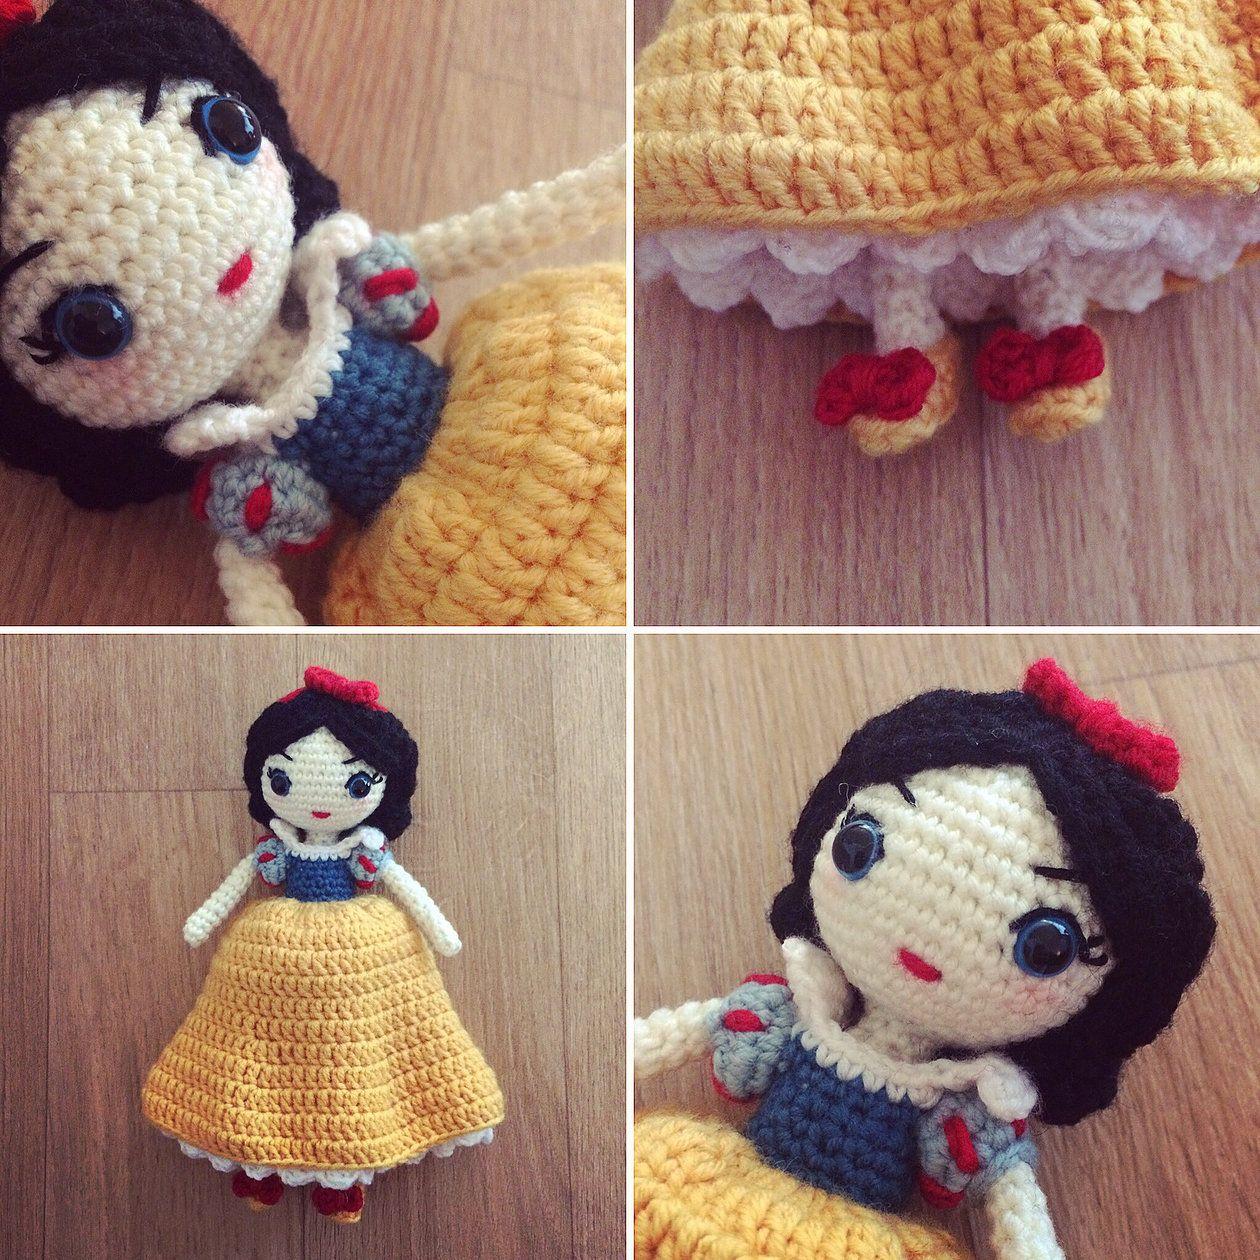 Snow White amigurumi doll | MyLittleCuteAmis - Amigurumi and crochet ...